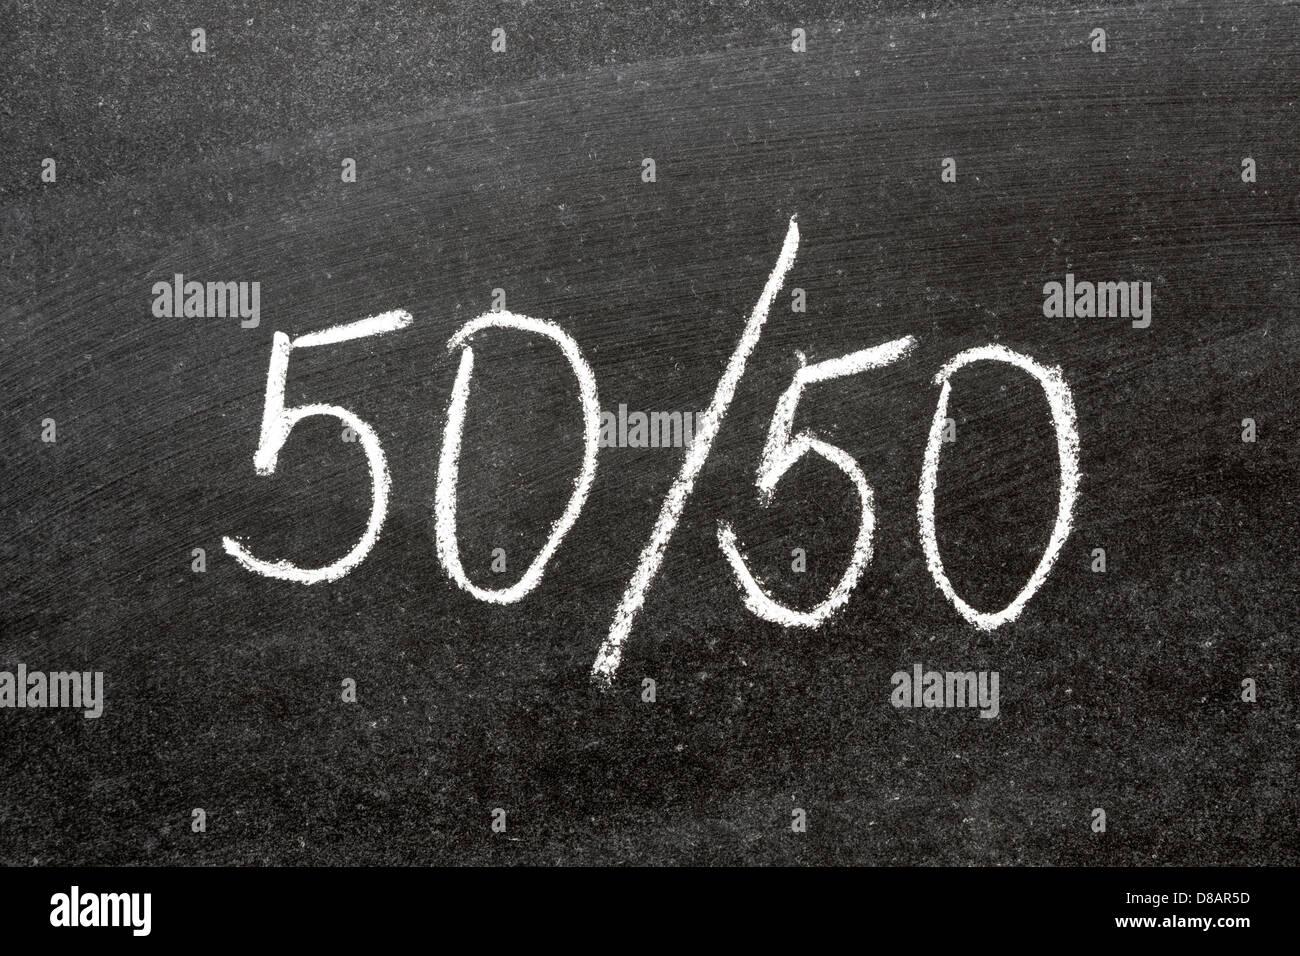 simple fifty-fifty ratio handwritten on blackboard - Stock Image